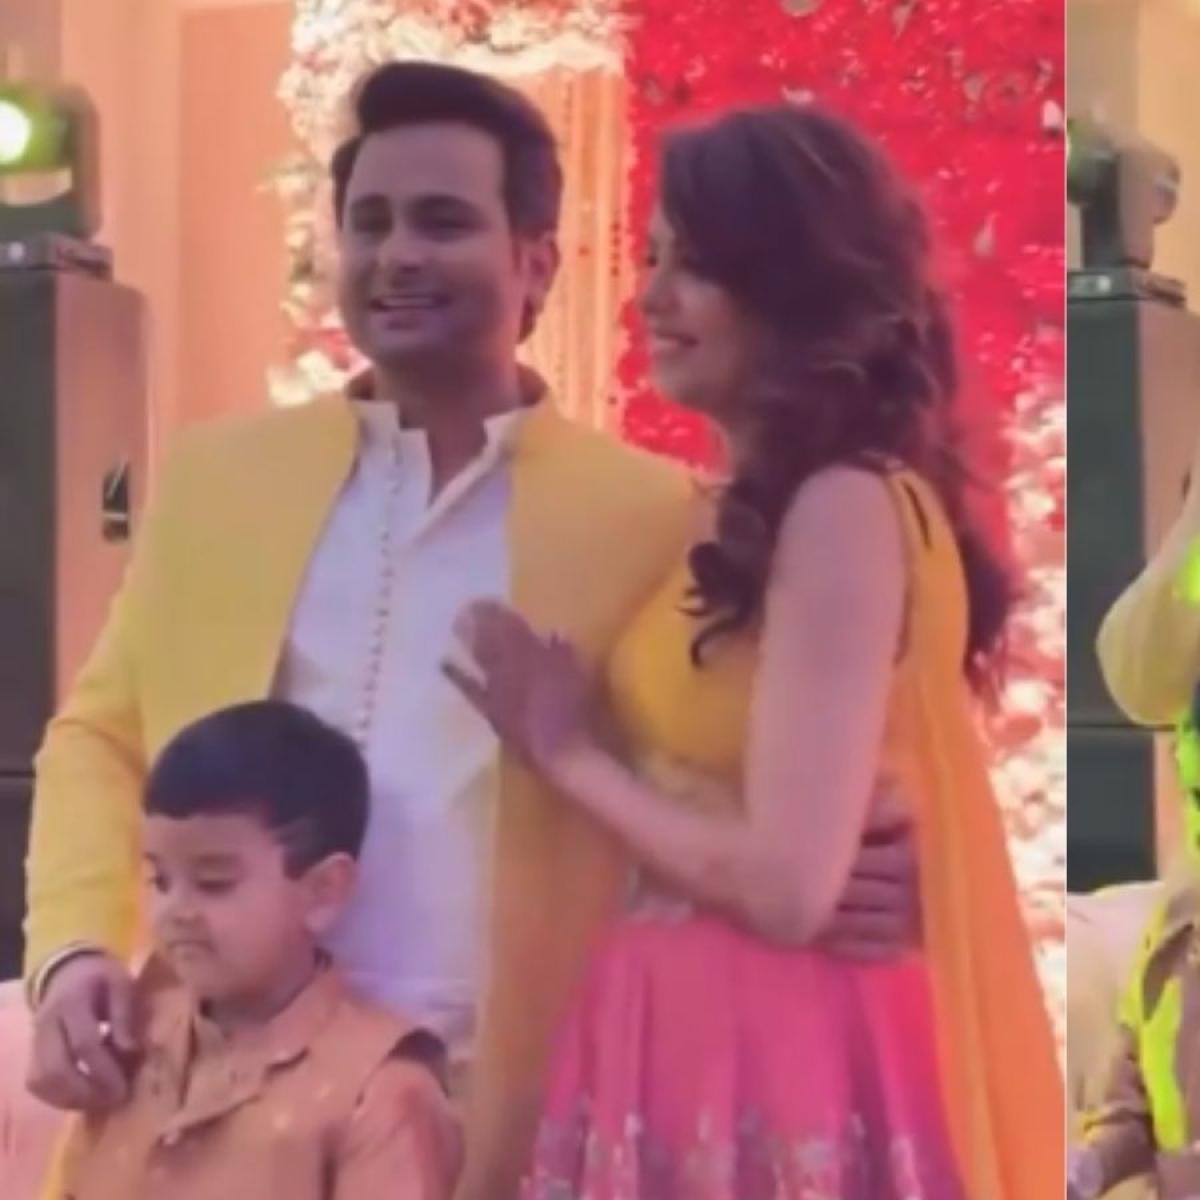 Watch: Sanket Bhosale gets emotional while confessing his feelings for Sugandha Mishra